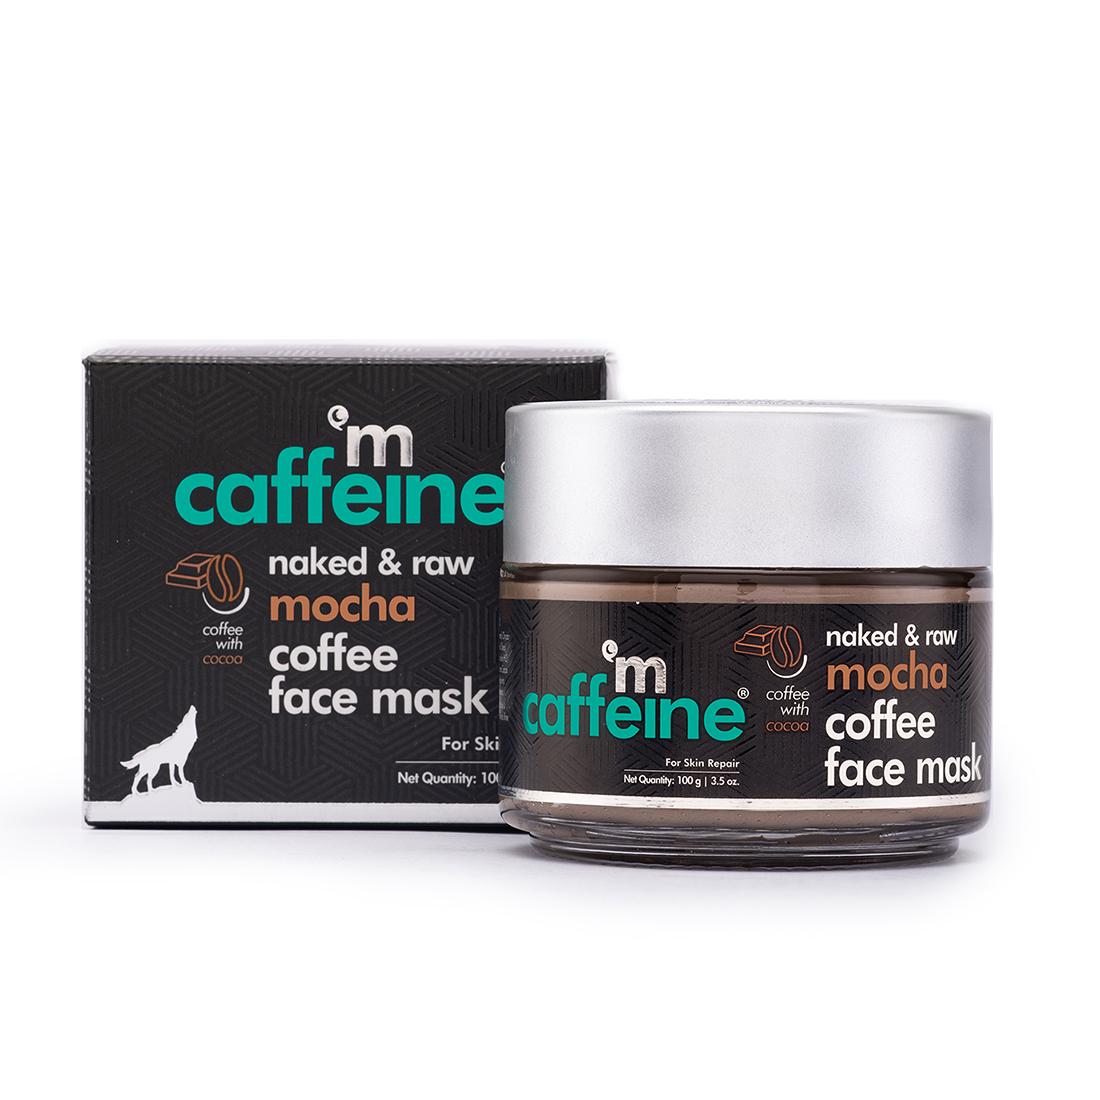 MCaffeine | mCaffeine Naked & Raw Mocha Coffee Face Mask